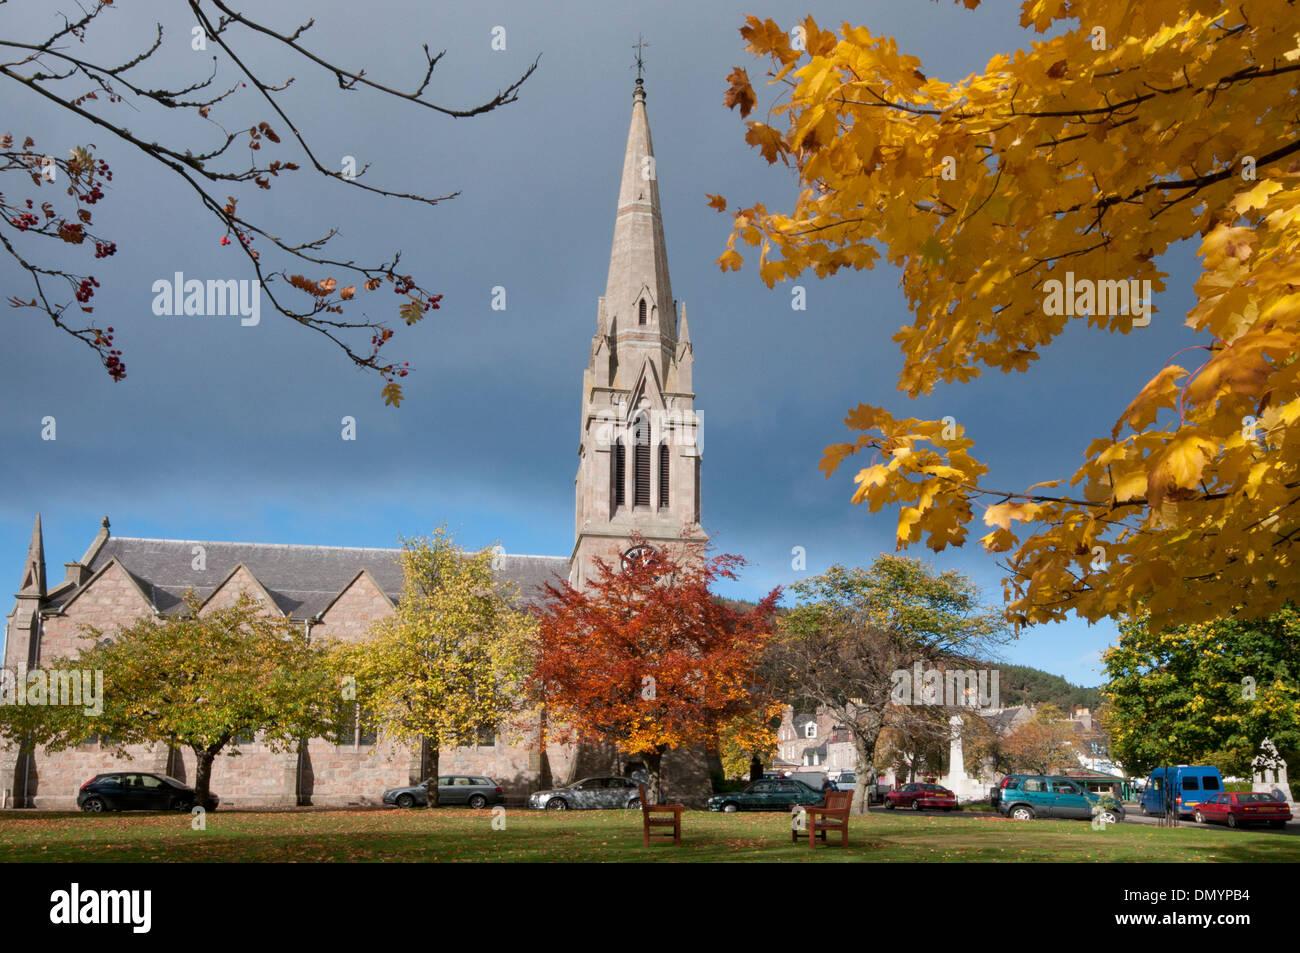 ballater church spire in autumn colour at glenmuick church - Stock Image